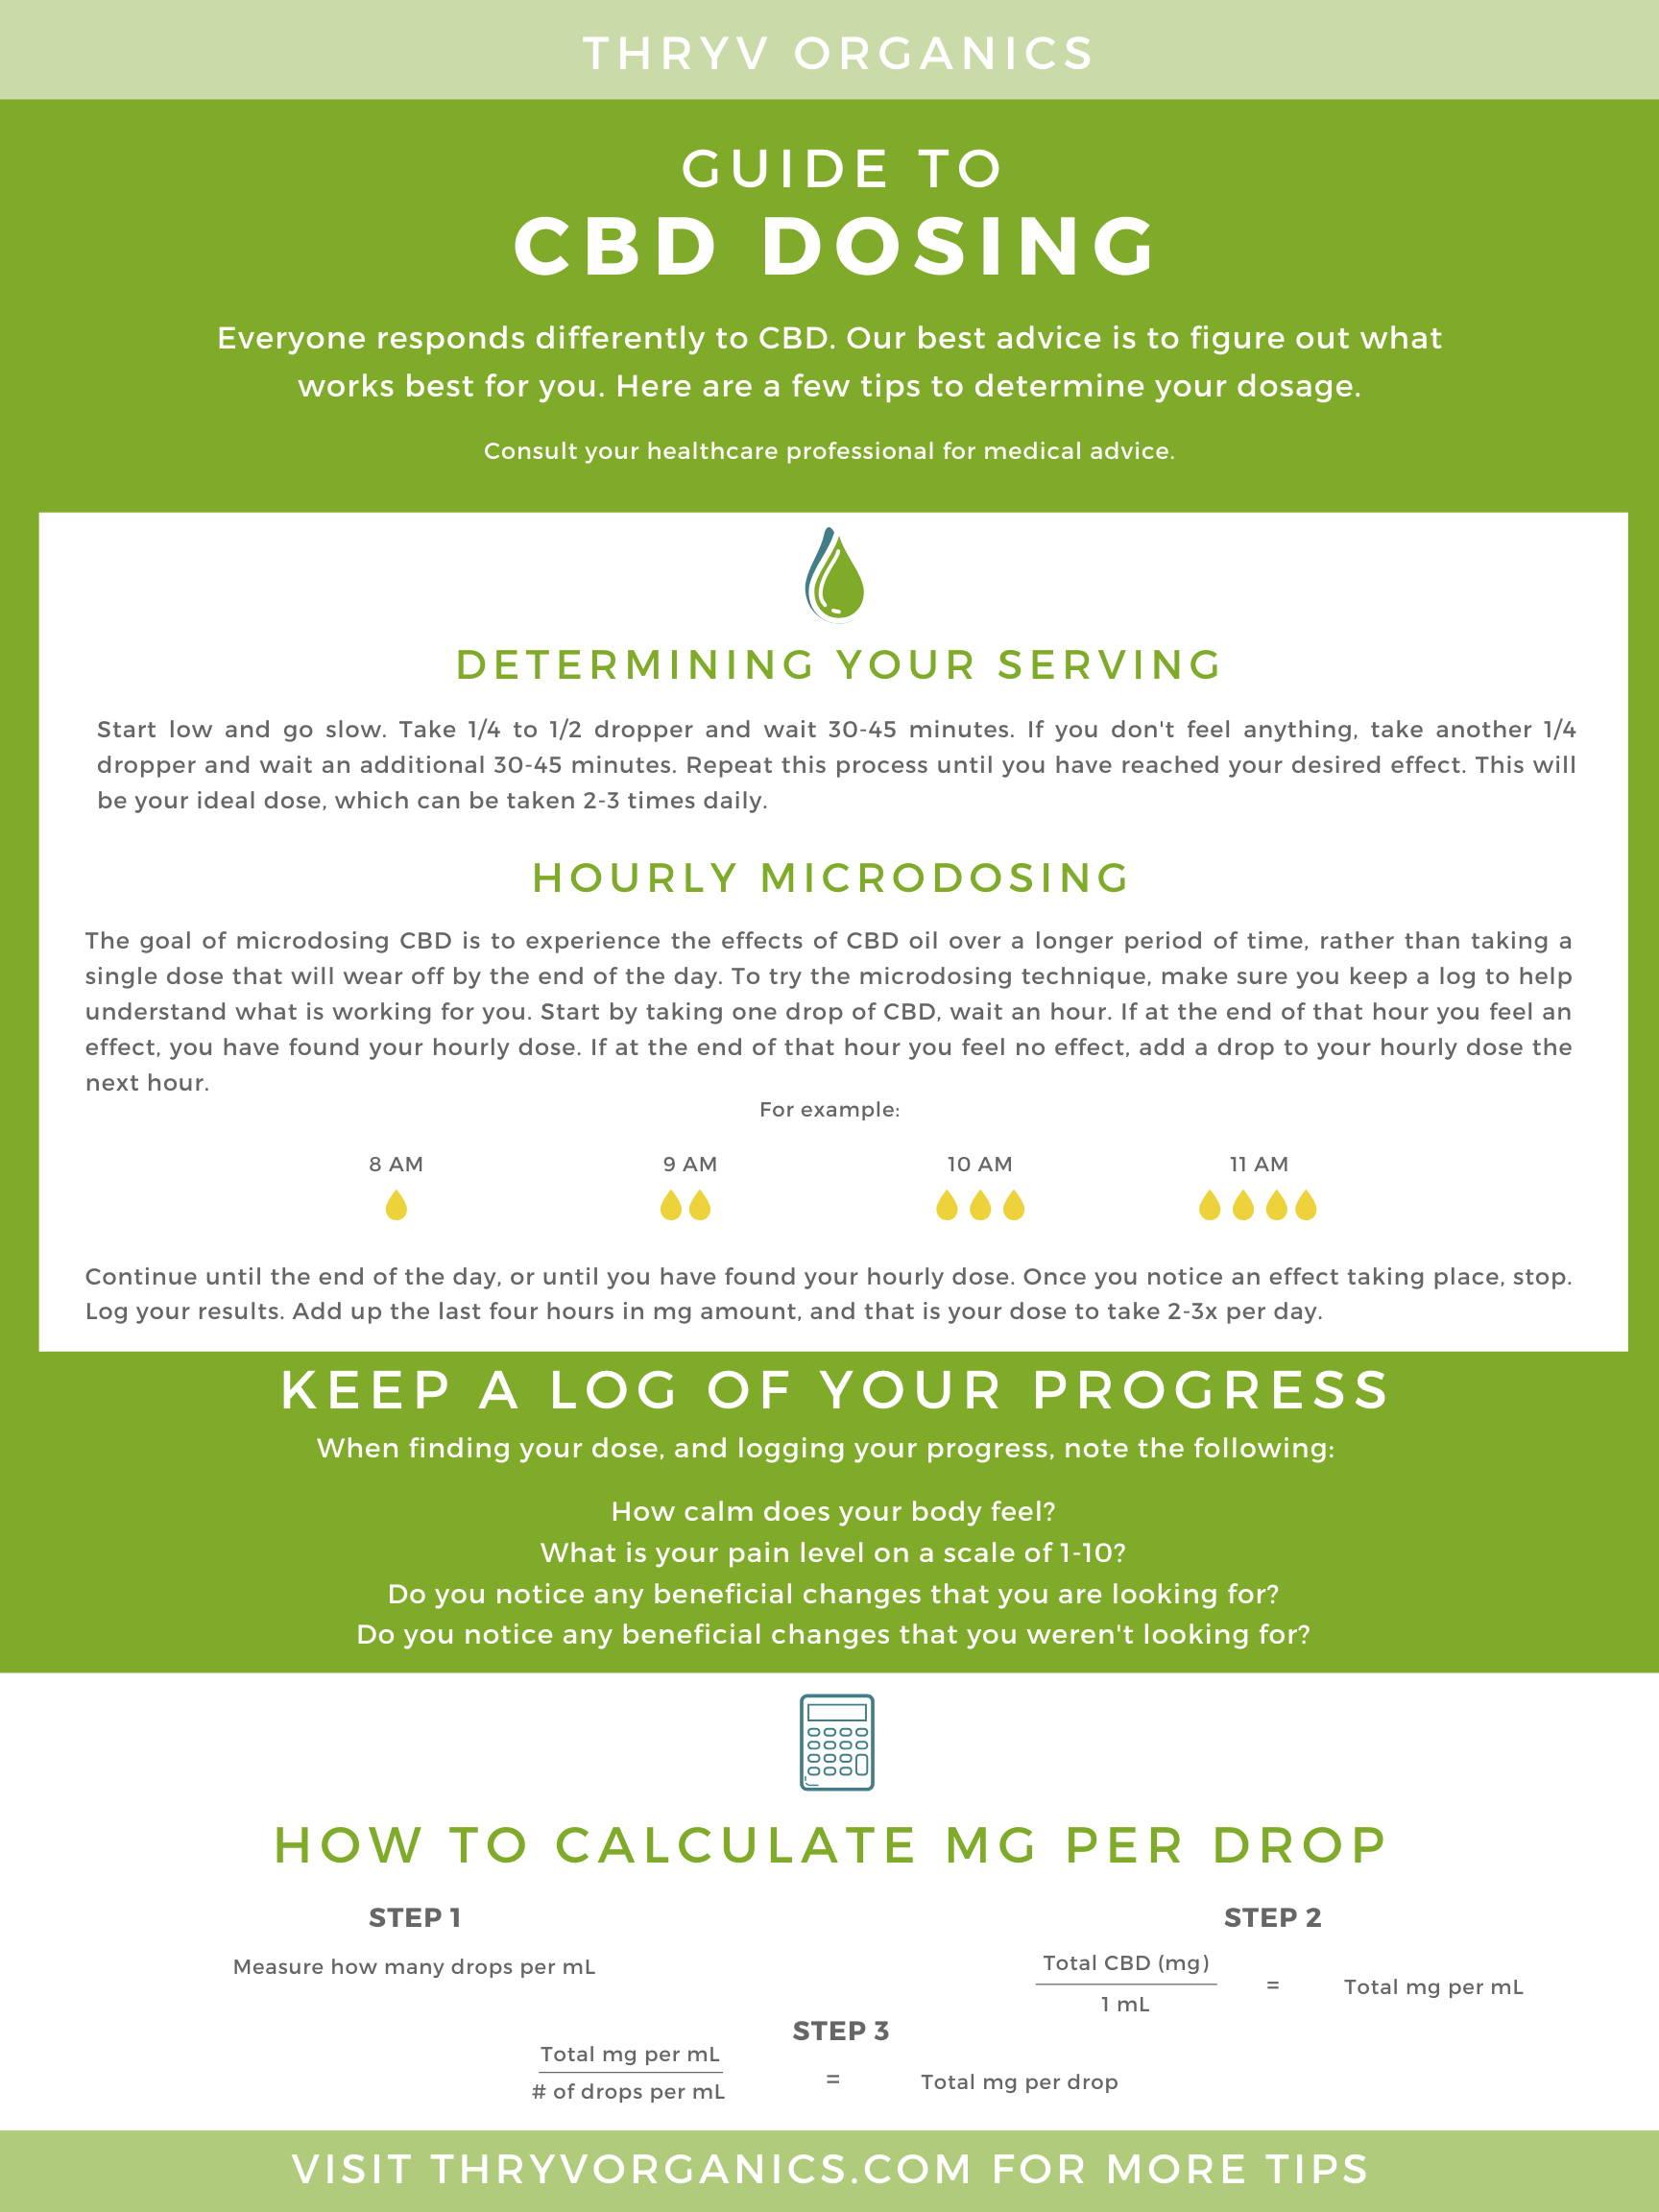 Thryv Organics CBD Dosing Guide